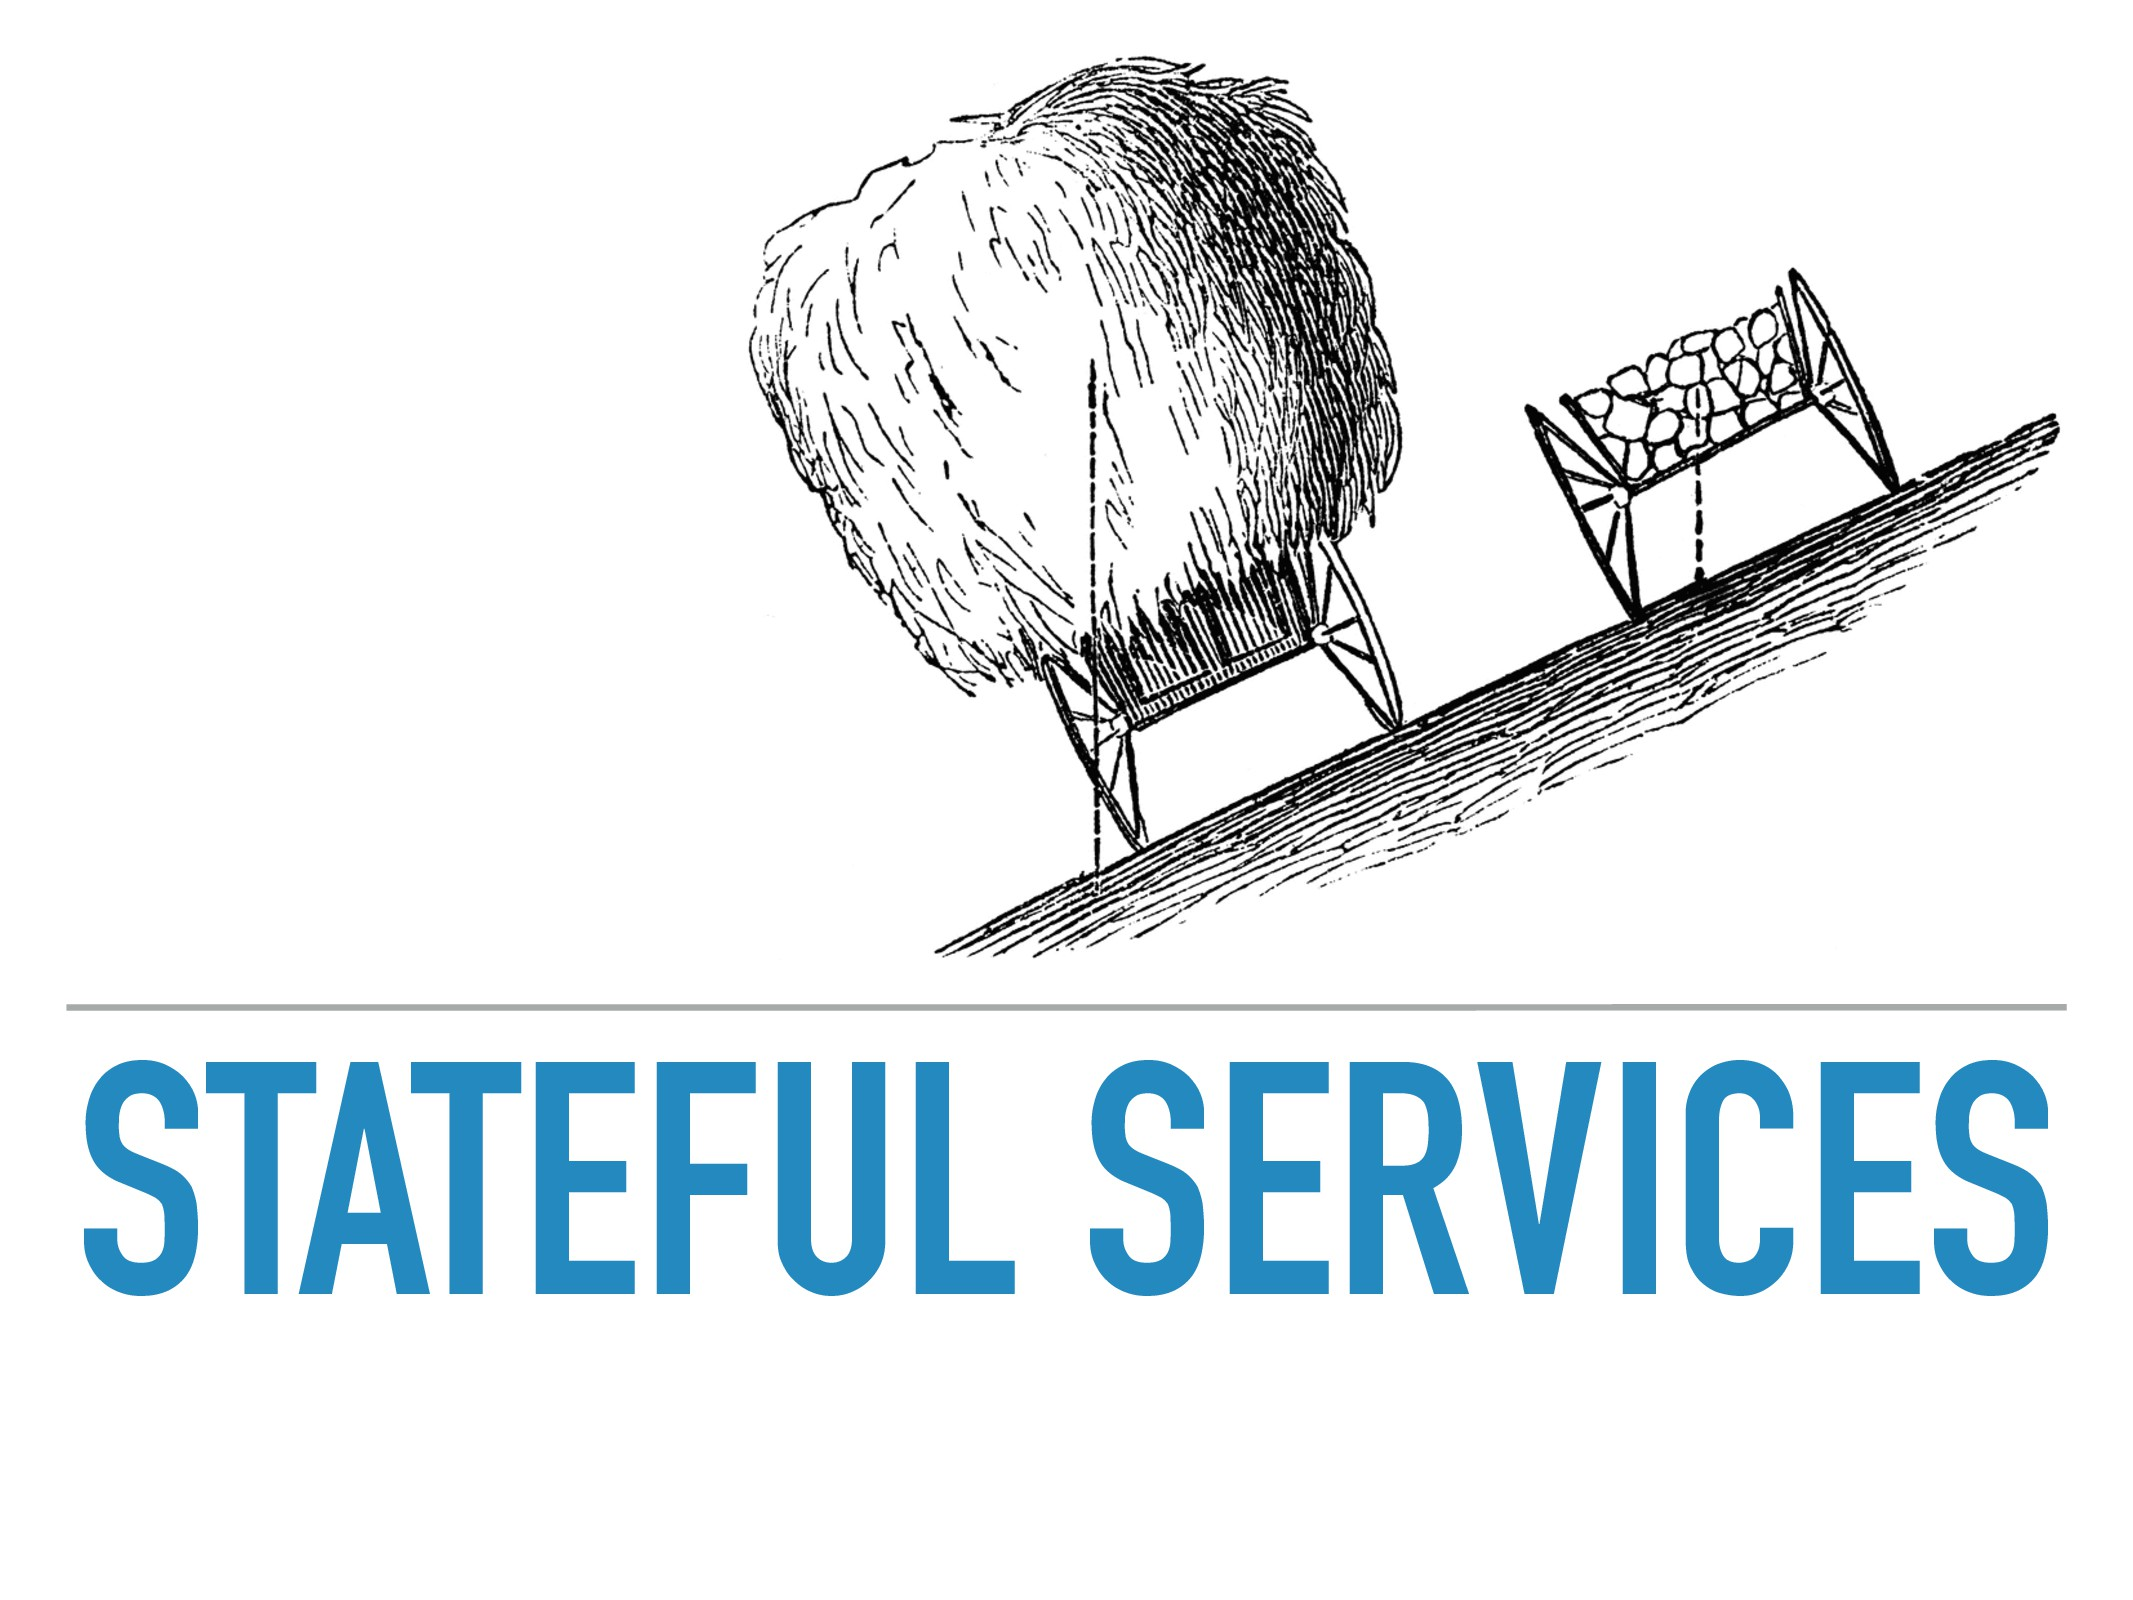 STATEFUL SERVICES